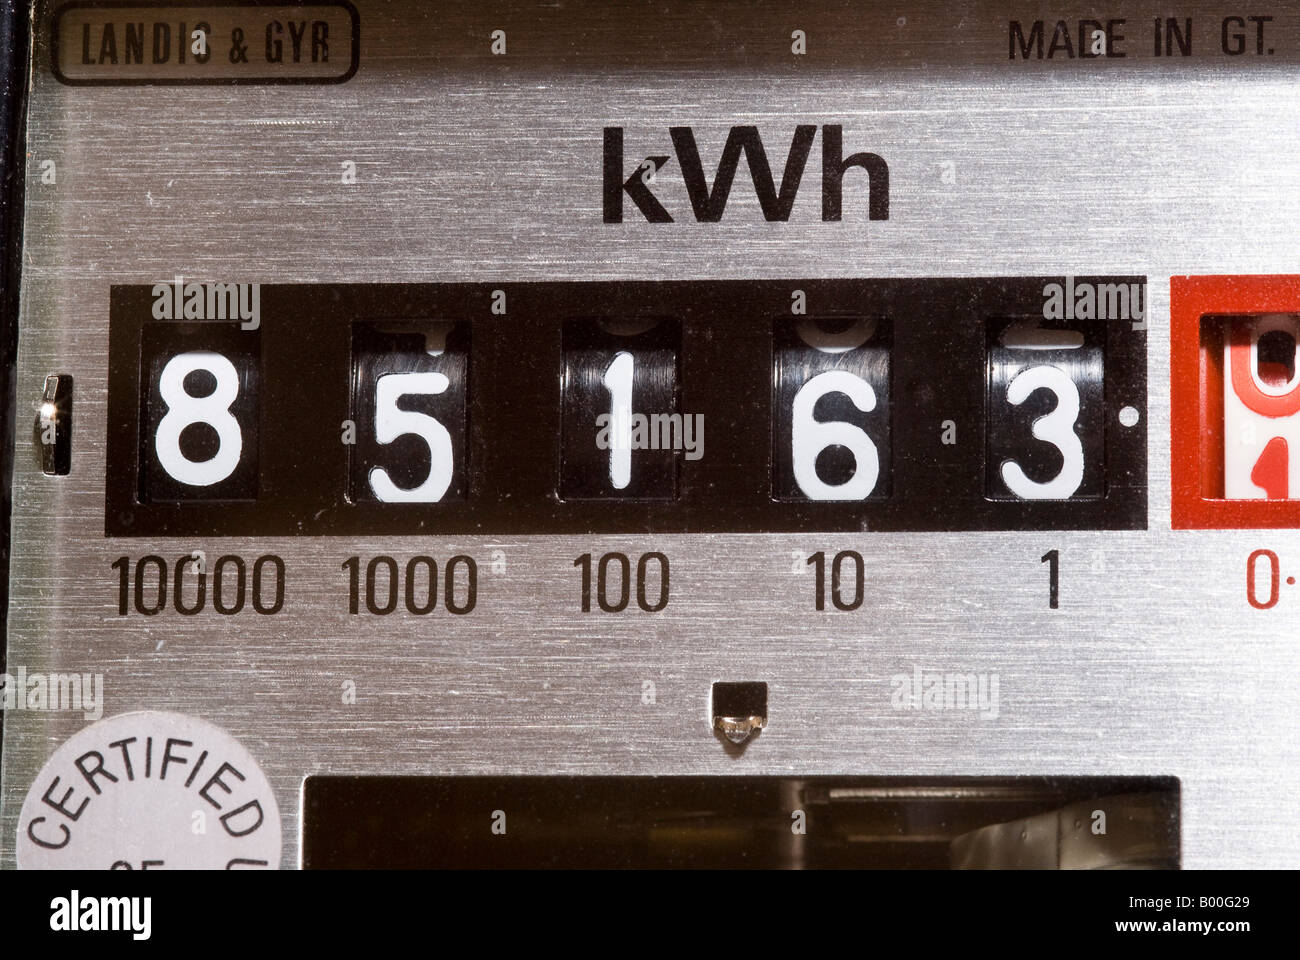 Electricity Meter Display - Stock Image